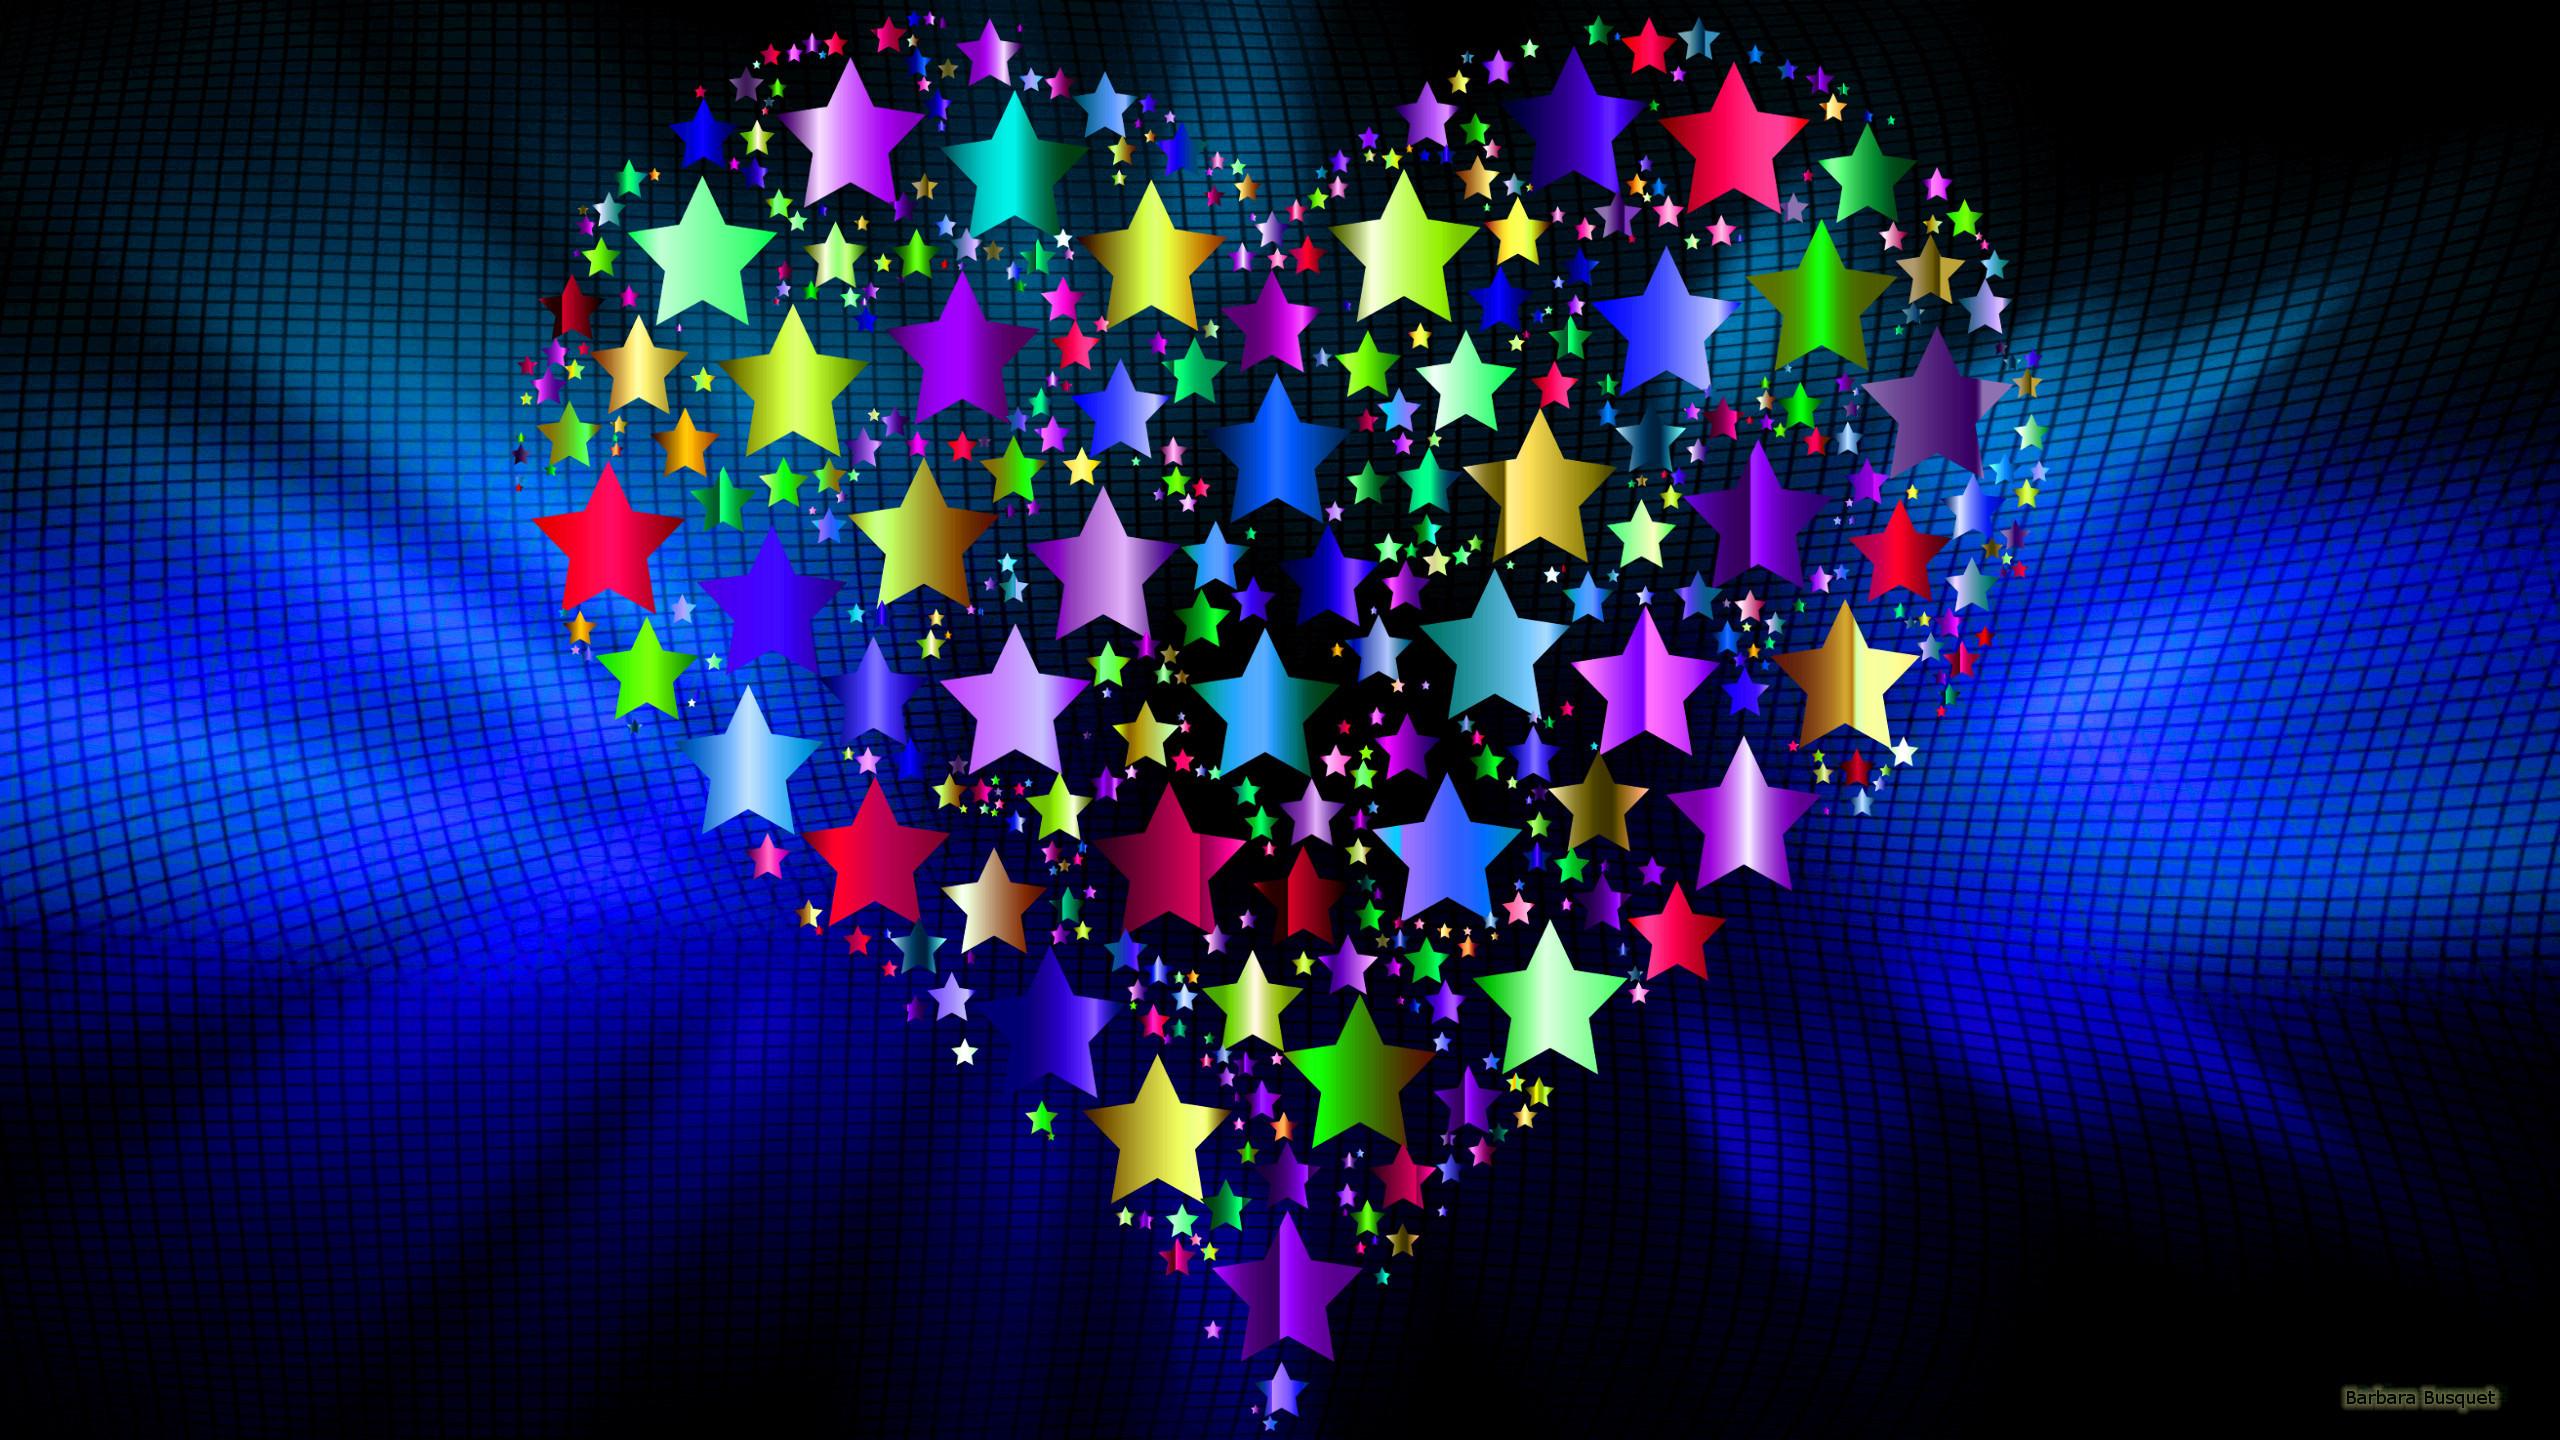 blue heart wallpaper 70 images